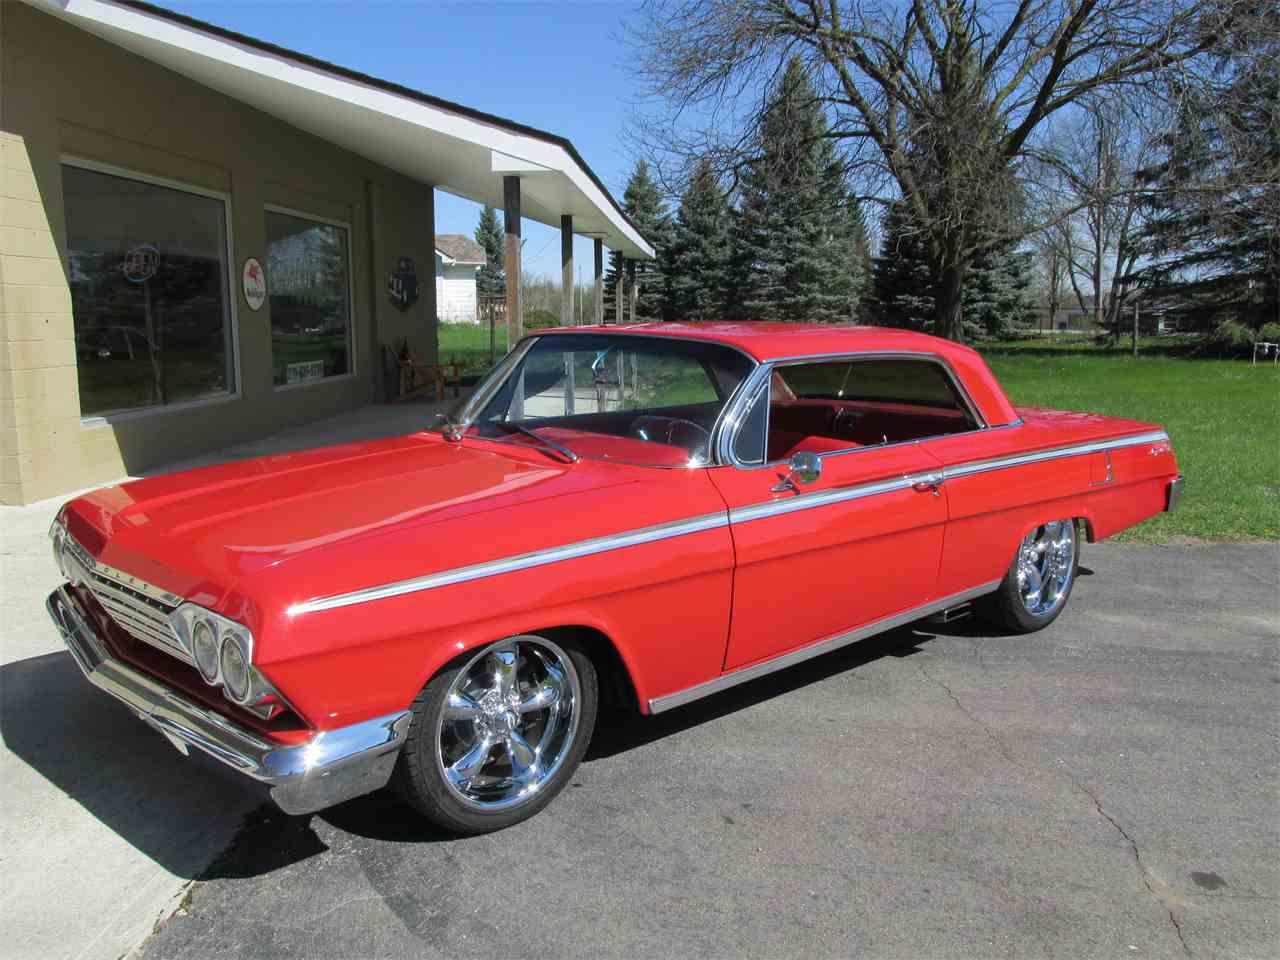 1962 chevrolet impala ss for sale cc 977991. Black Bedroom Furniture Sets. Home Design Ideas